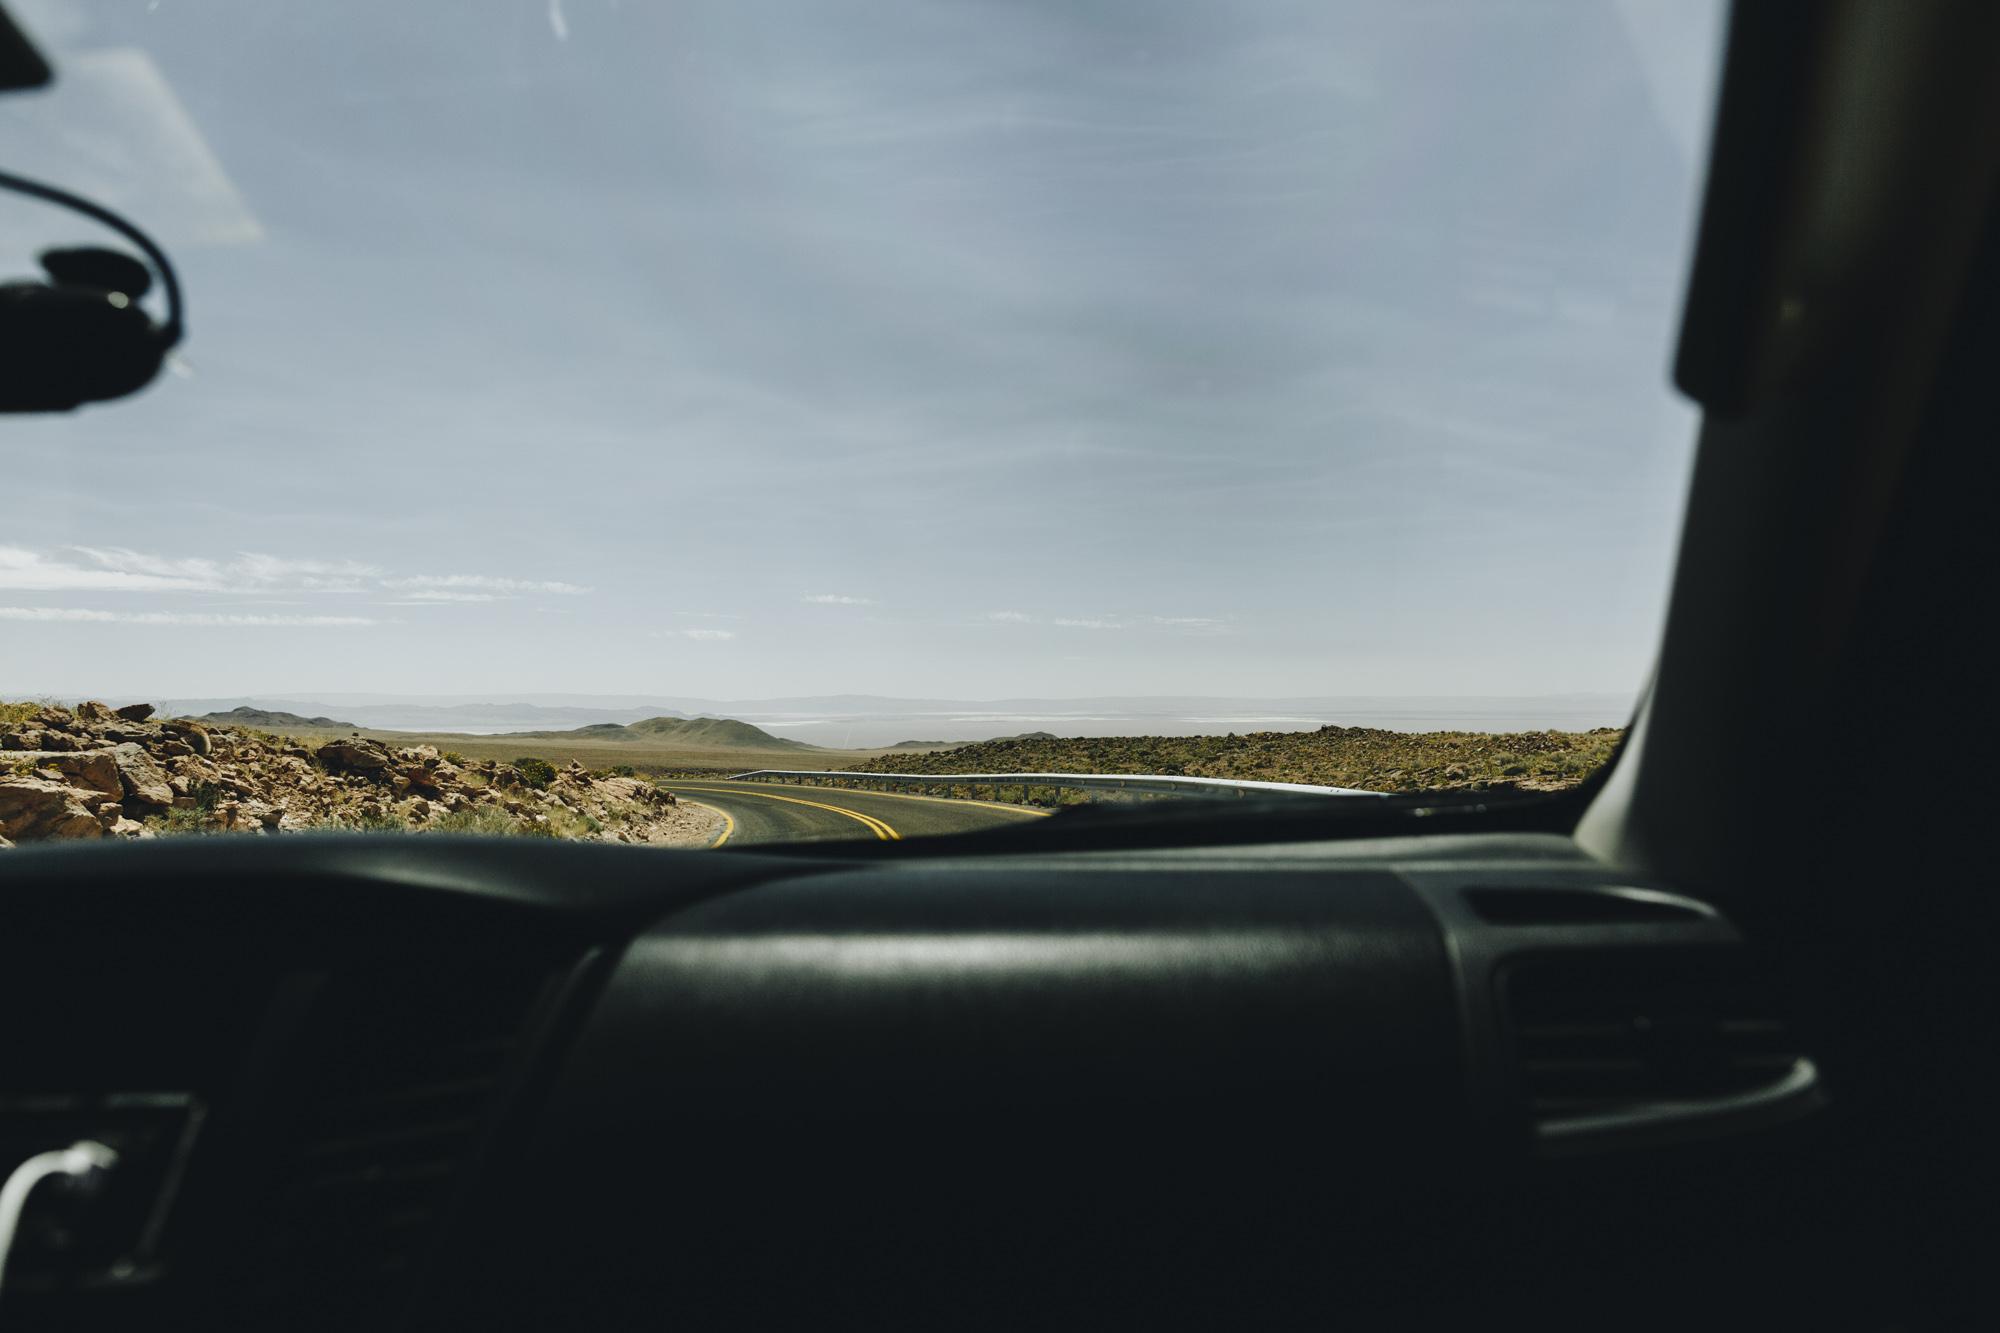 Mael Lambla photographer Chile San pedro atacama desert-256.jpg